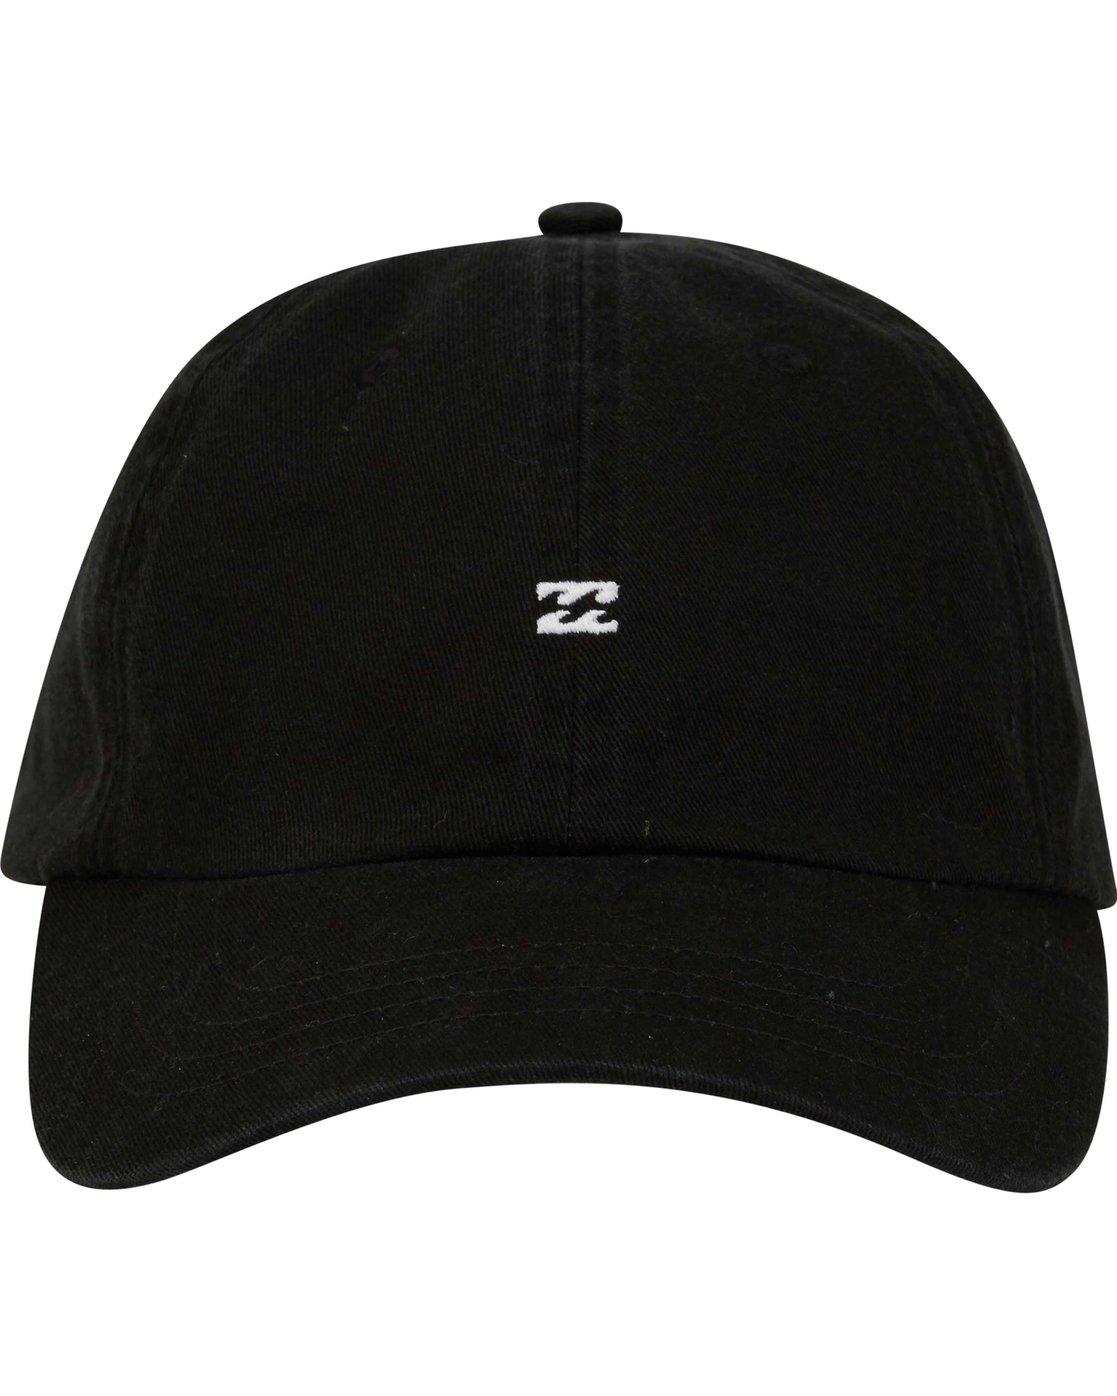 6b8cdc02c41 1 All Day Lad Hat Black MAHTMADL Billabong